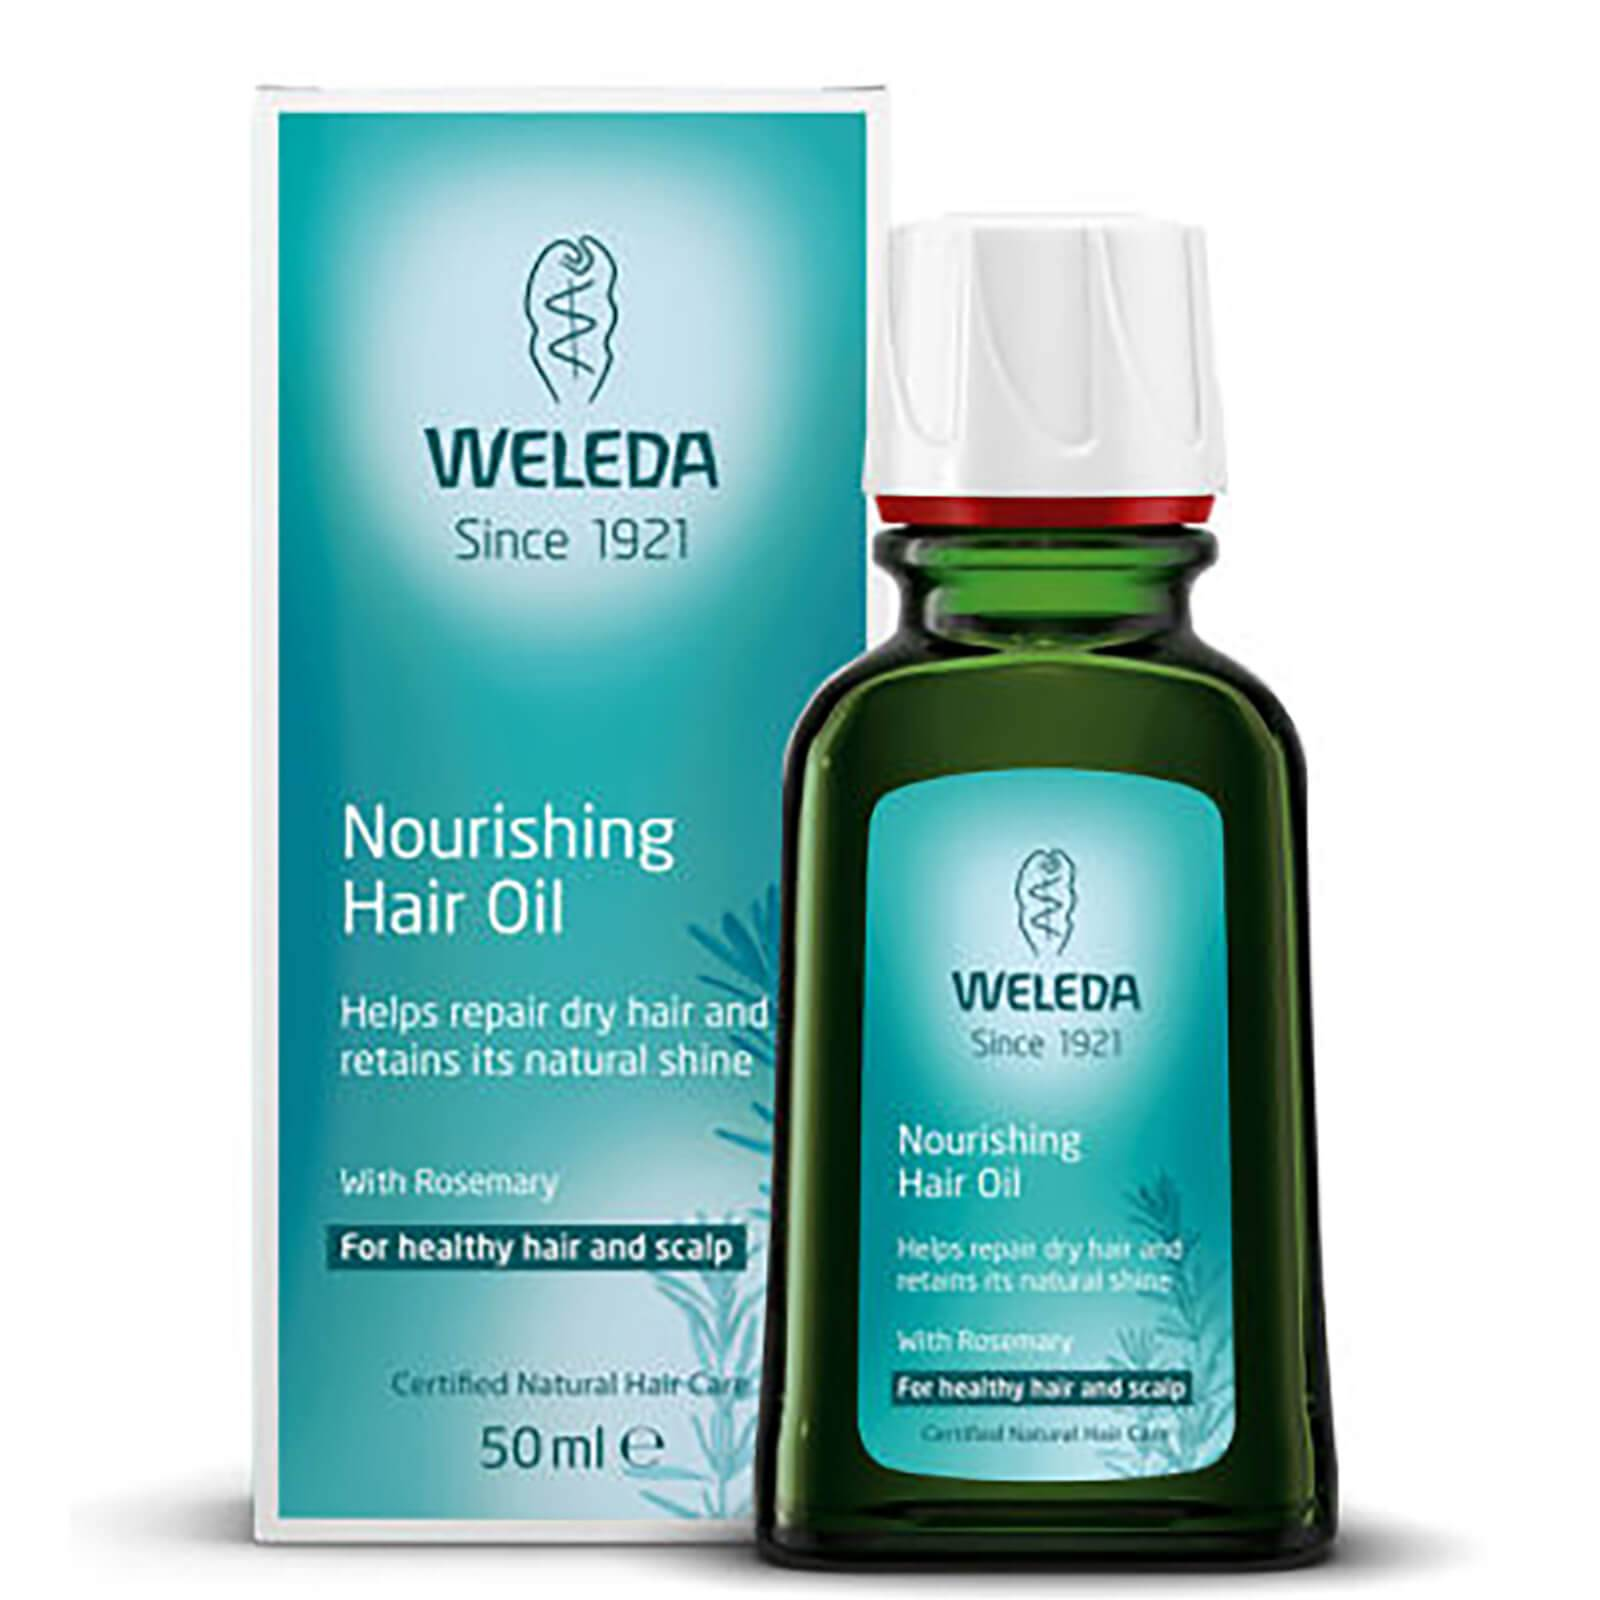 Weleda Huile capillaire au romarin de Weleda (50 ml)